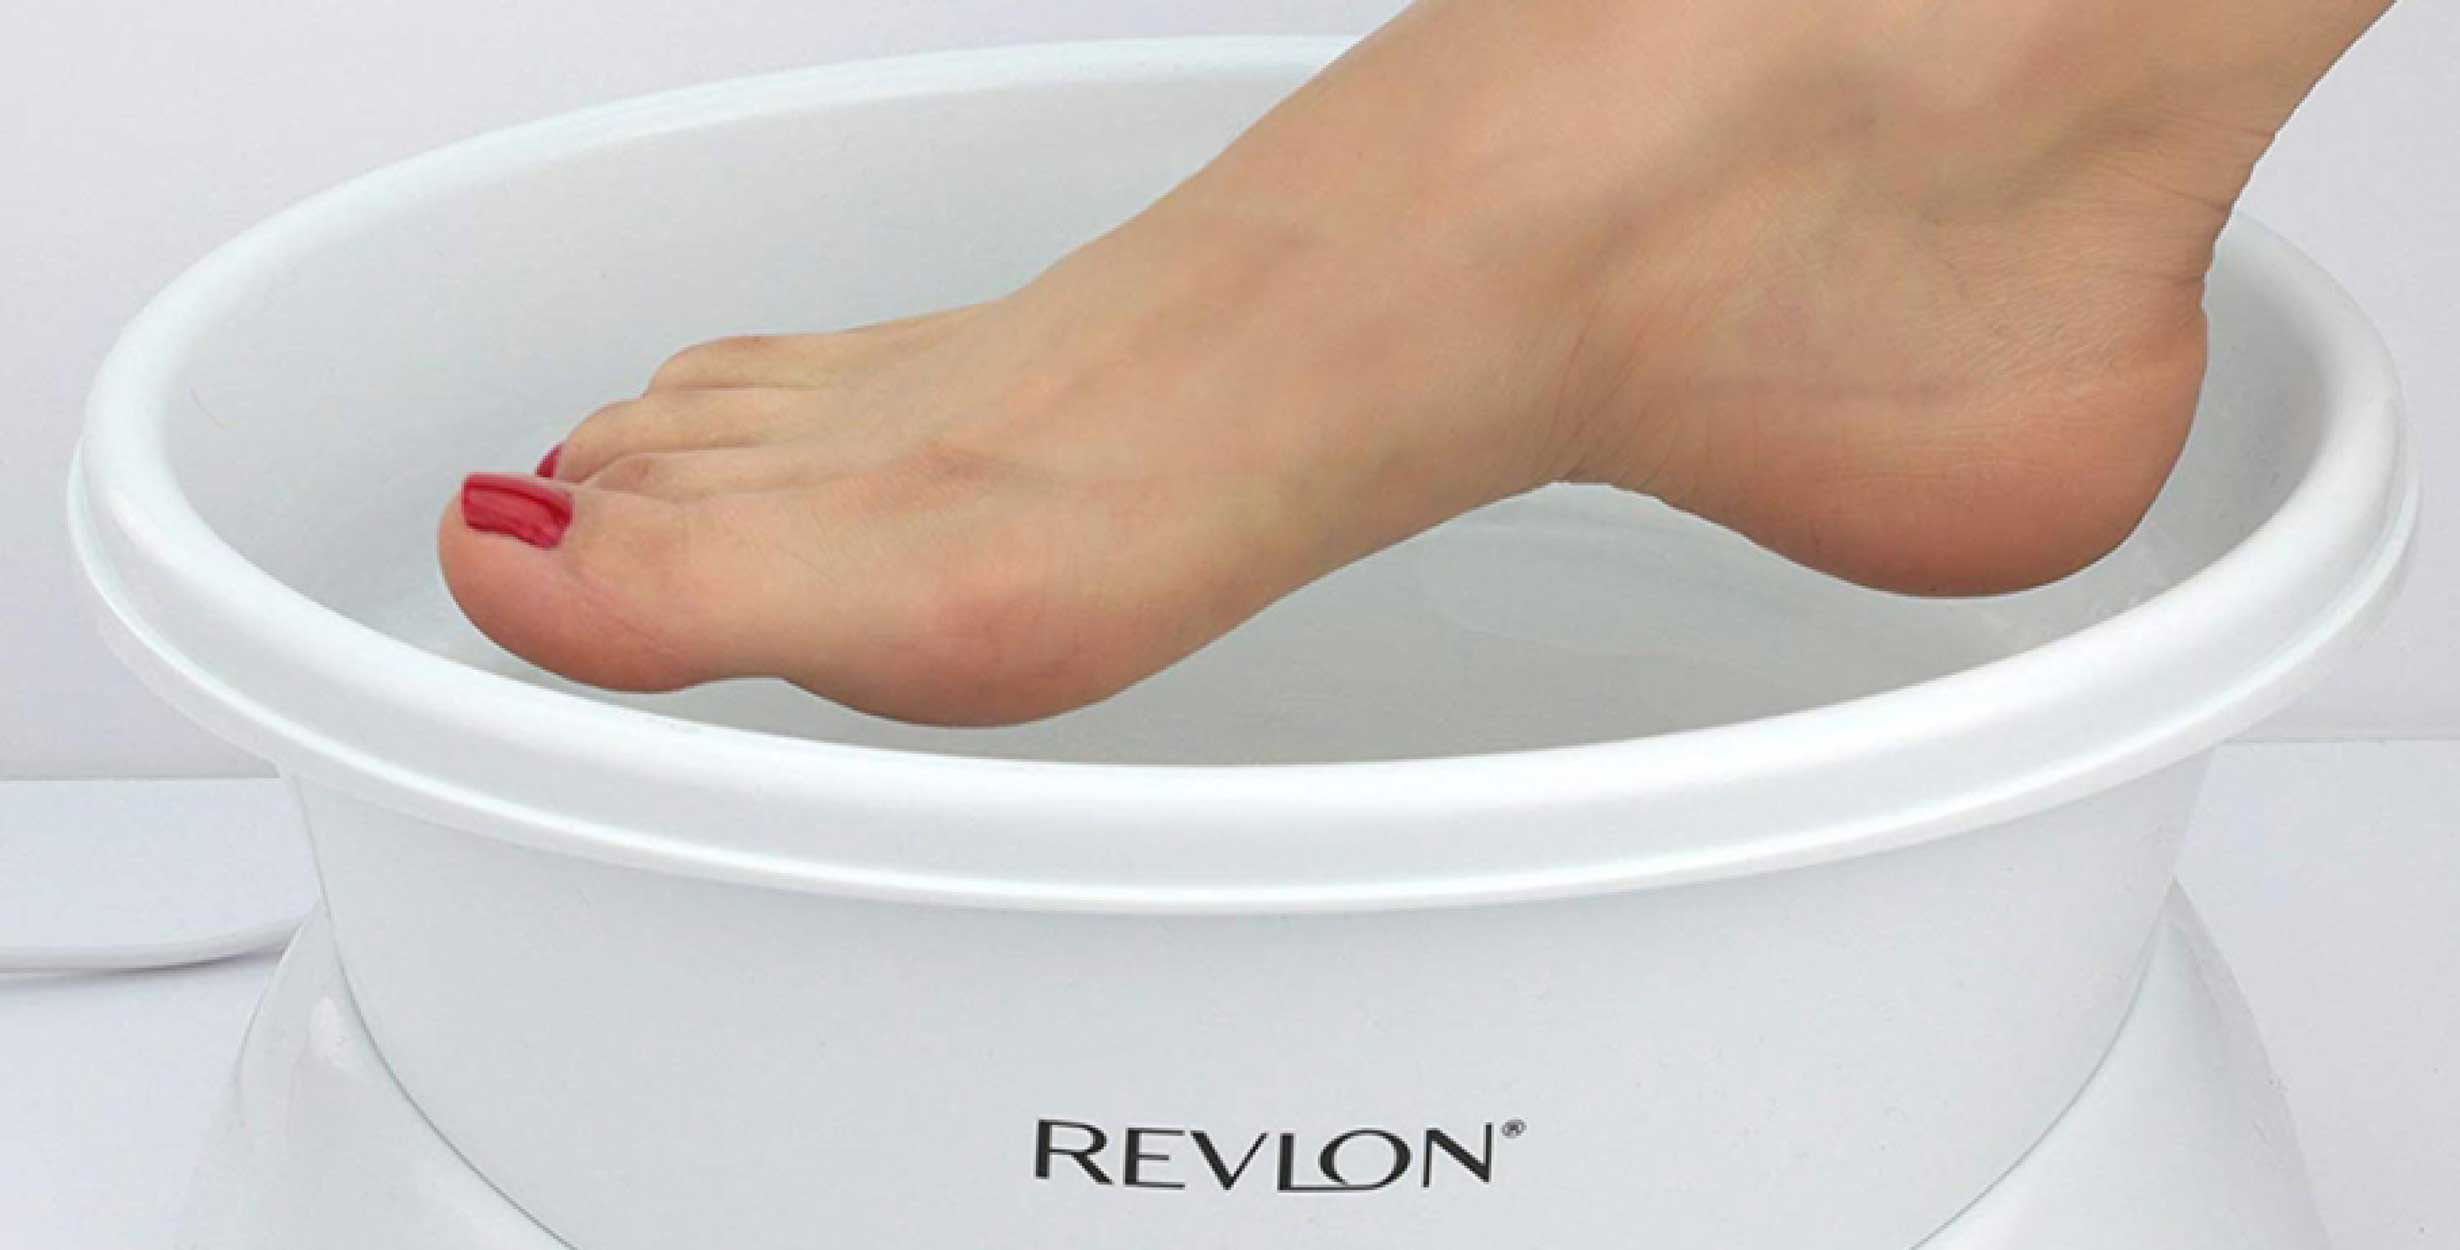 Paraffin wax for feet